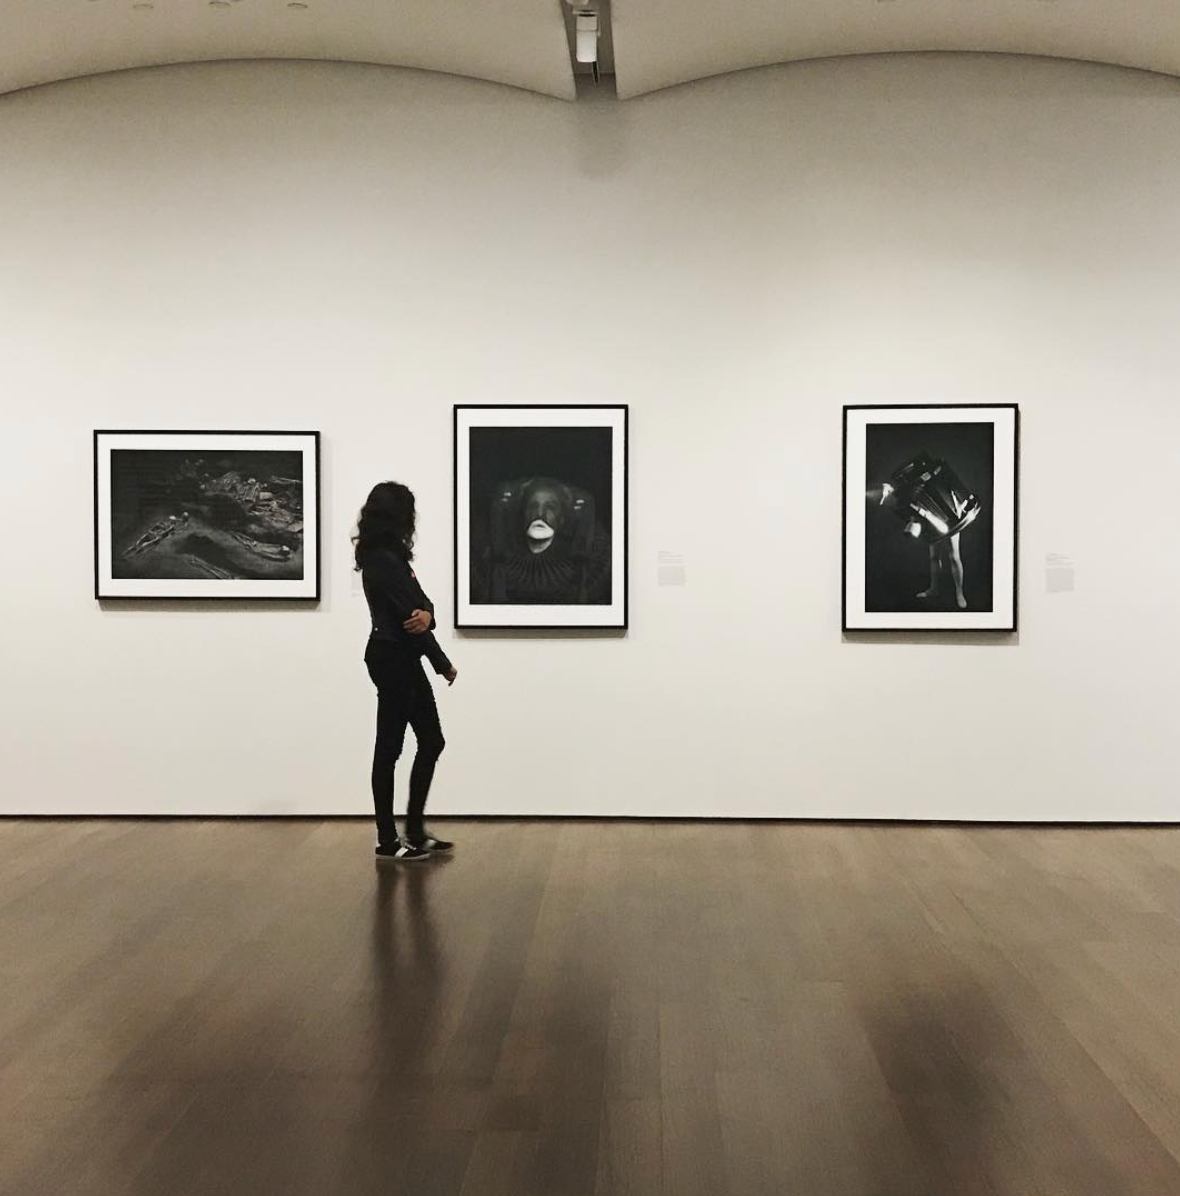 Photo courtesy of Harvard Art Museums instagram @harvardartmuseums